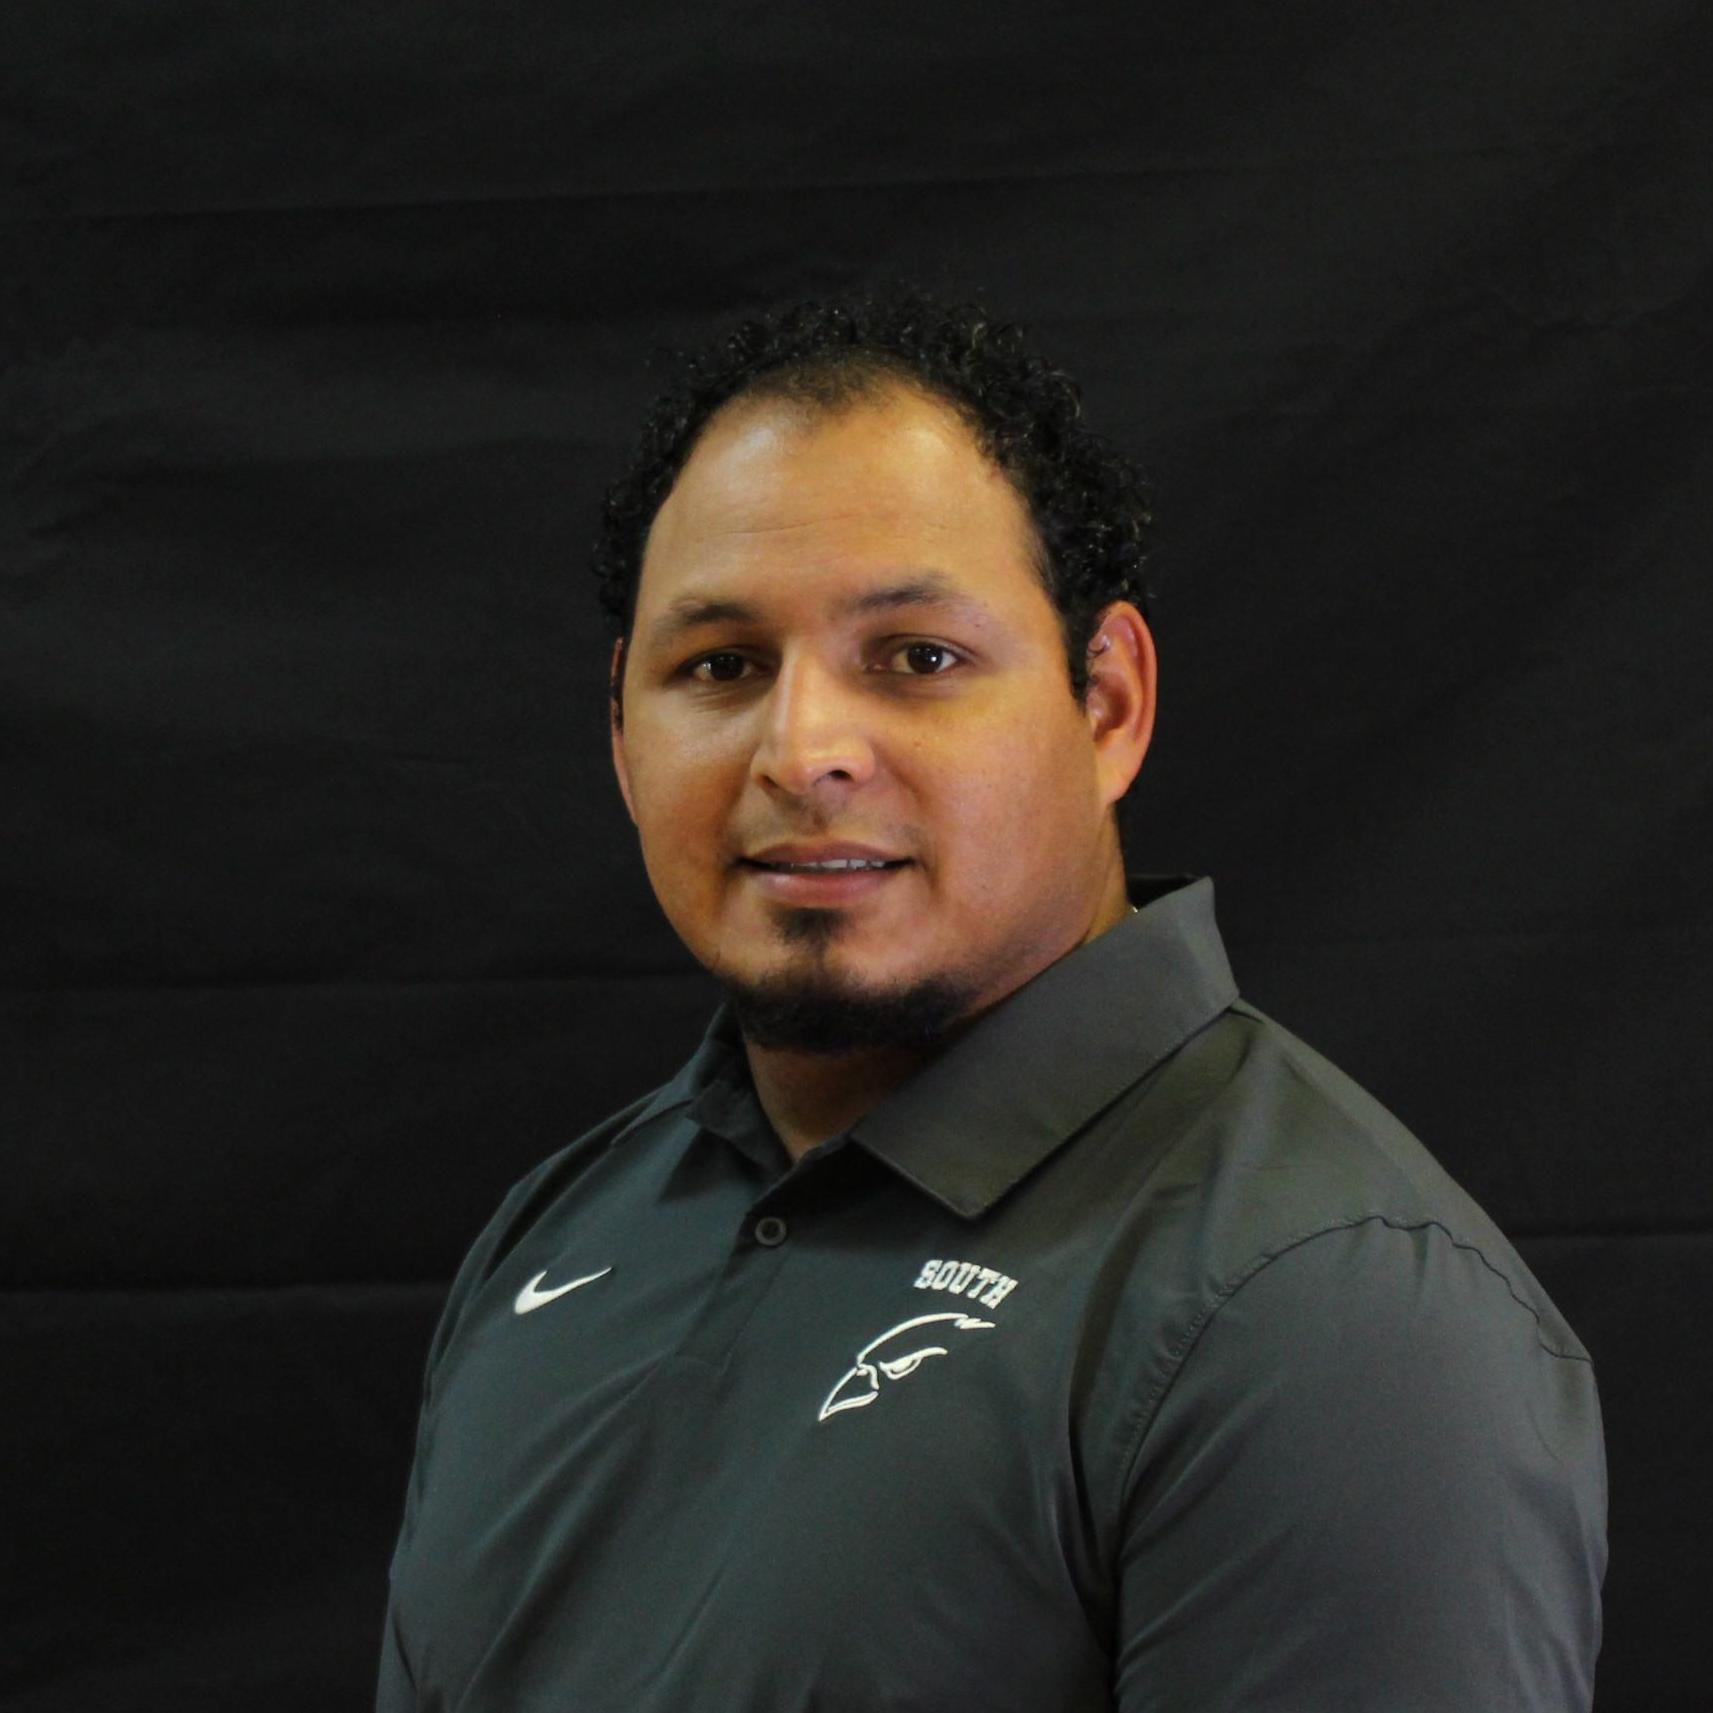 Jose Rios2's Profile Photo